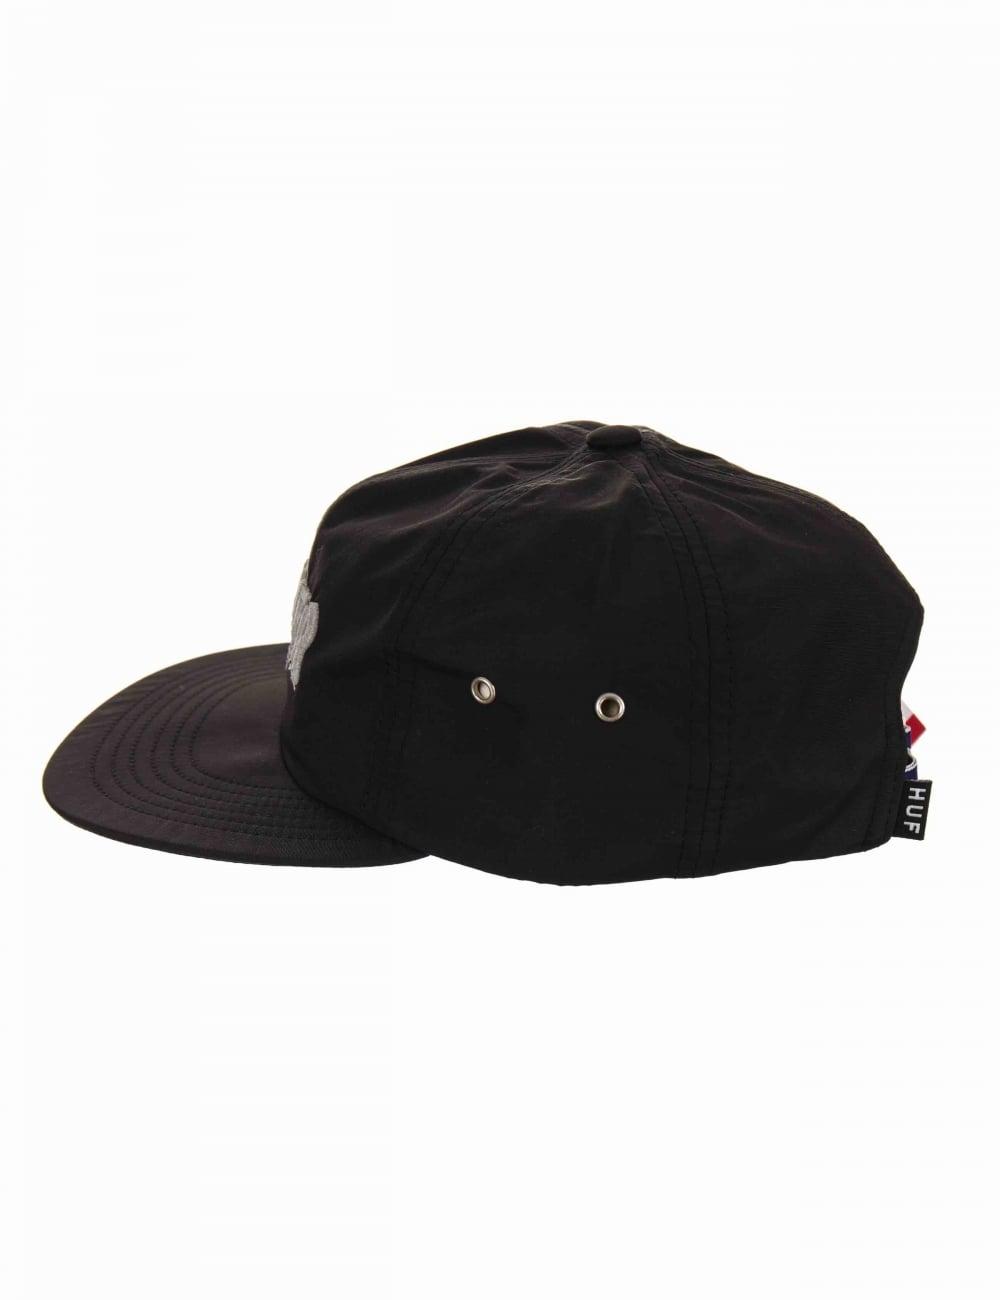 c09bac0e0bf06 Huf x Thrasher TDS 6 Panel Hat - Black - Hat Shop from Fat Buddha ...